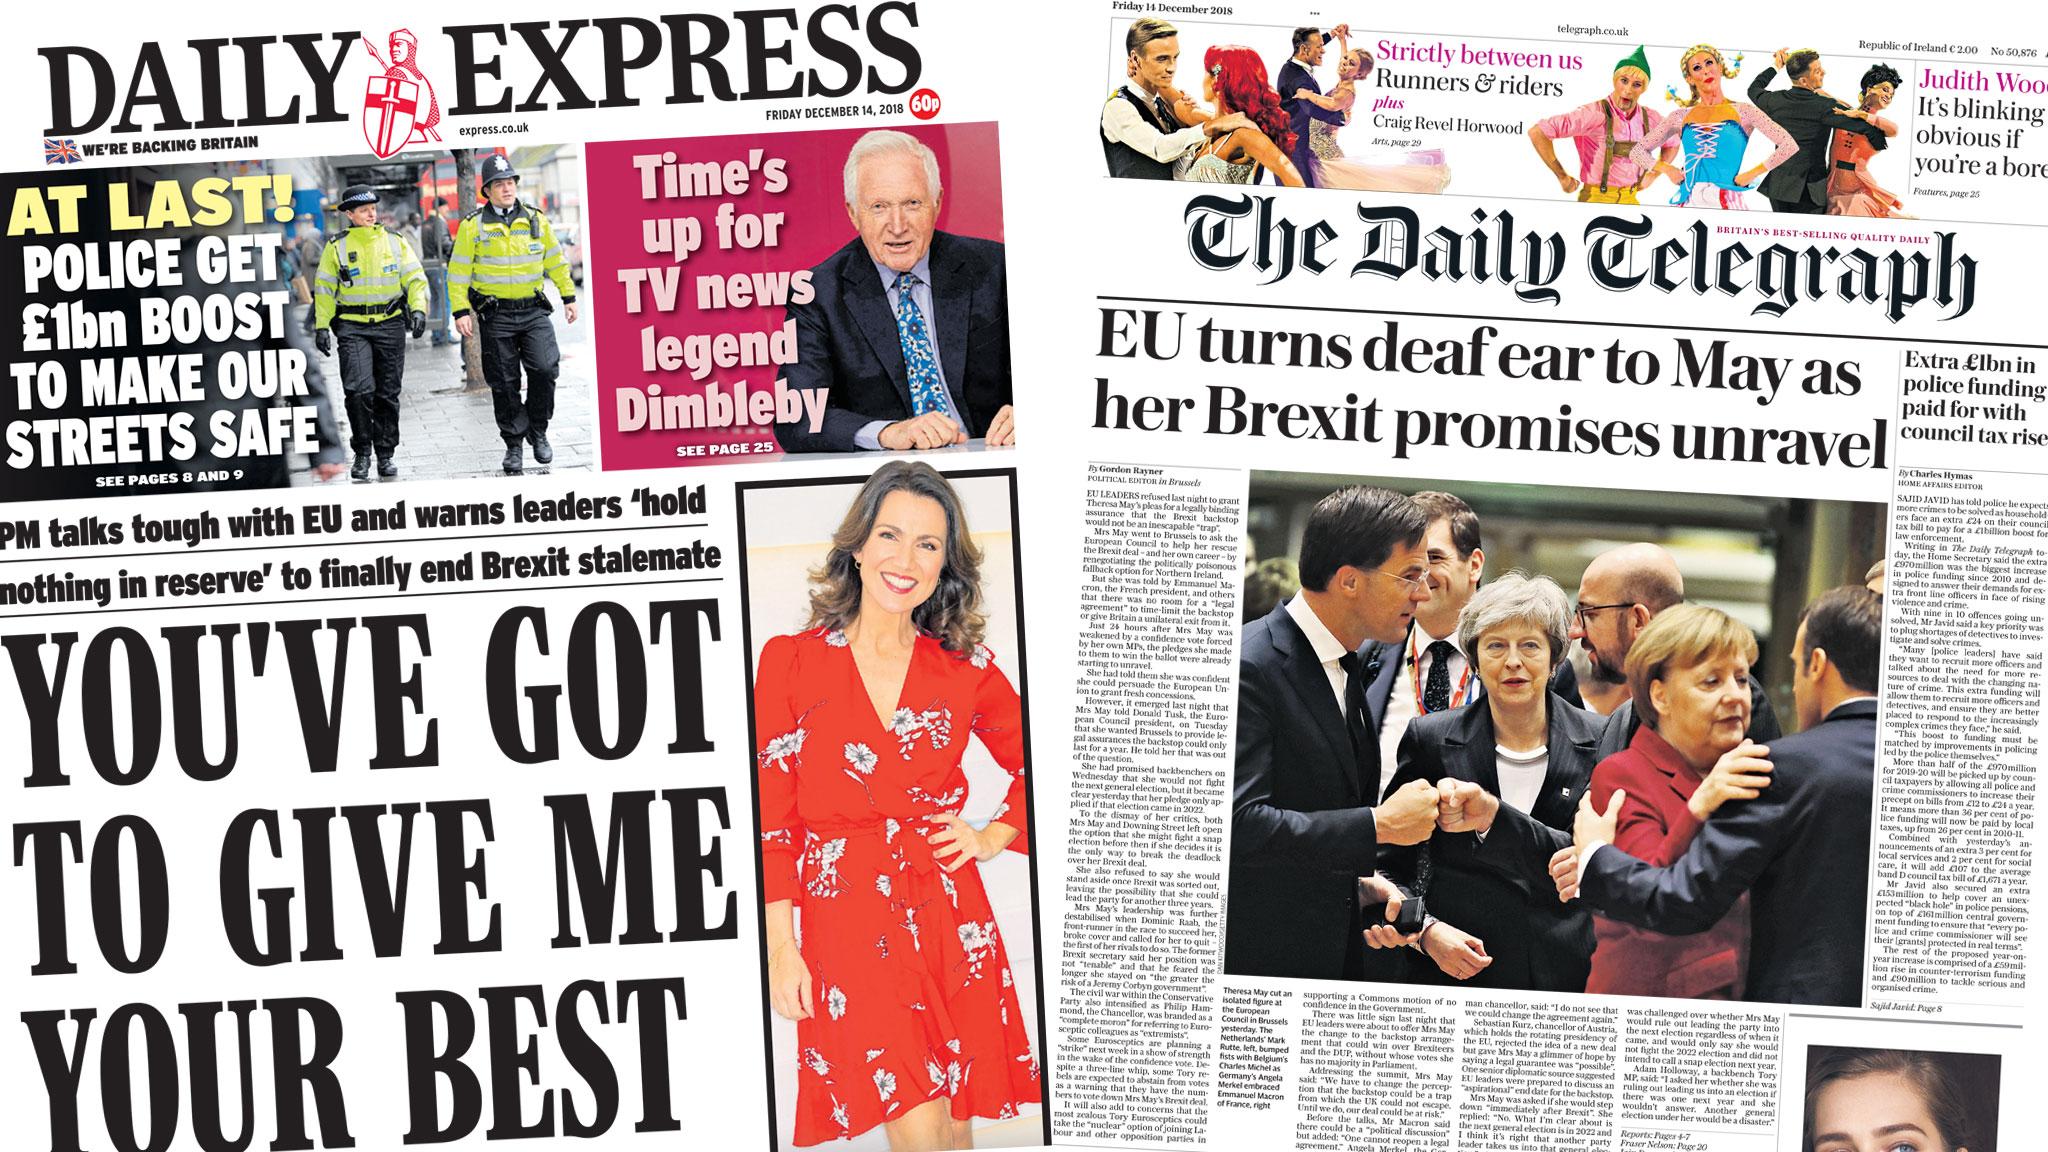 Paper review: May's 'last-ditch bid' as EU 'turns deaf ear'